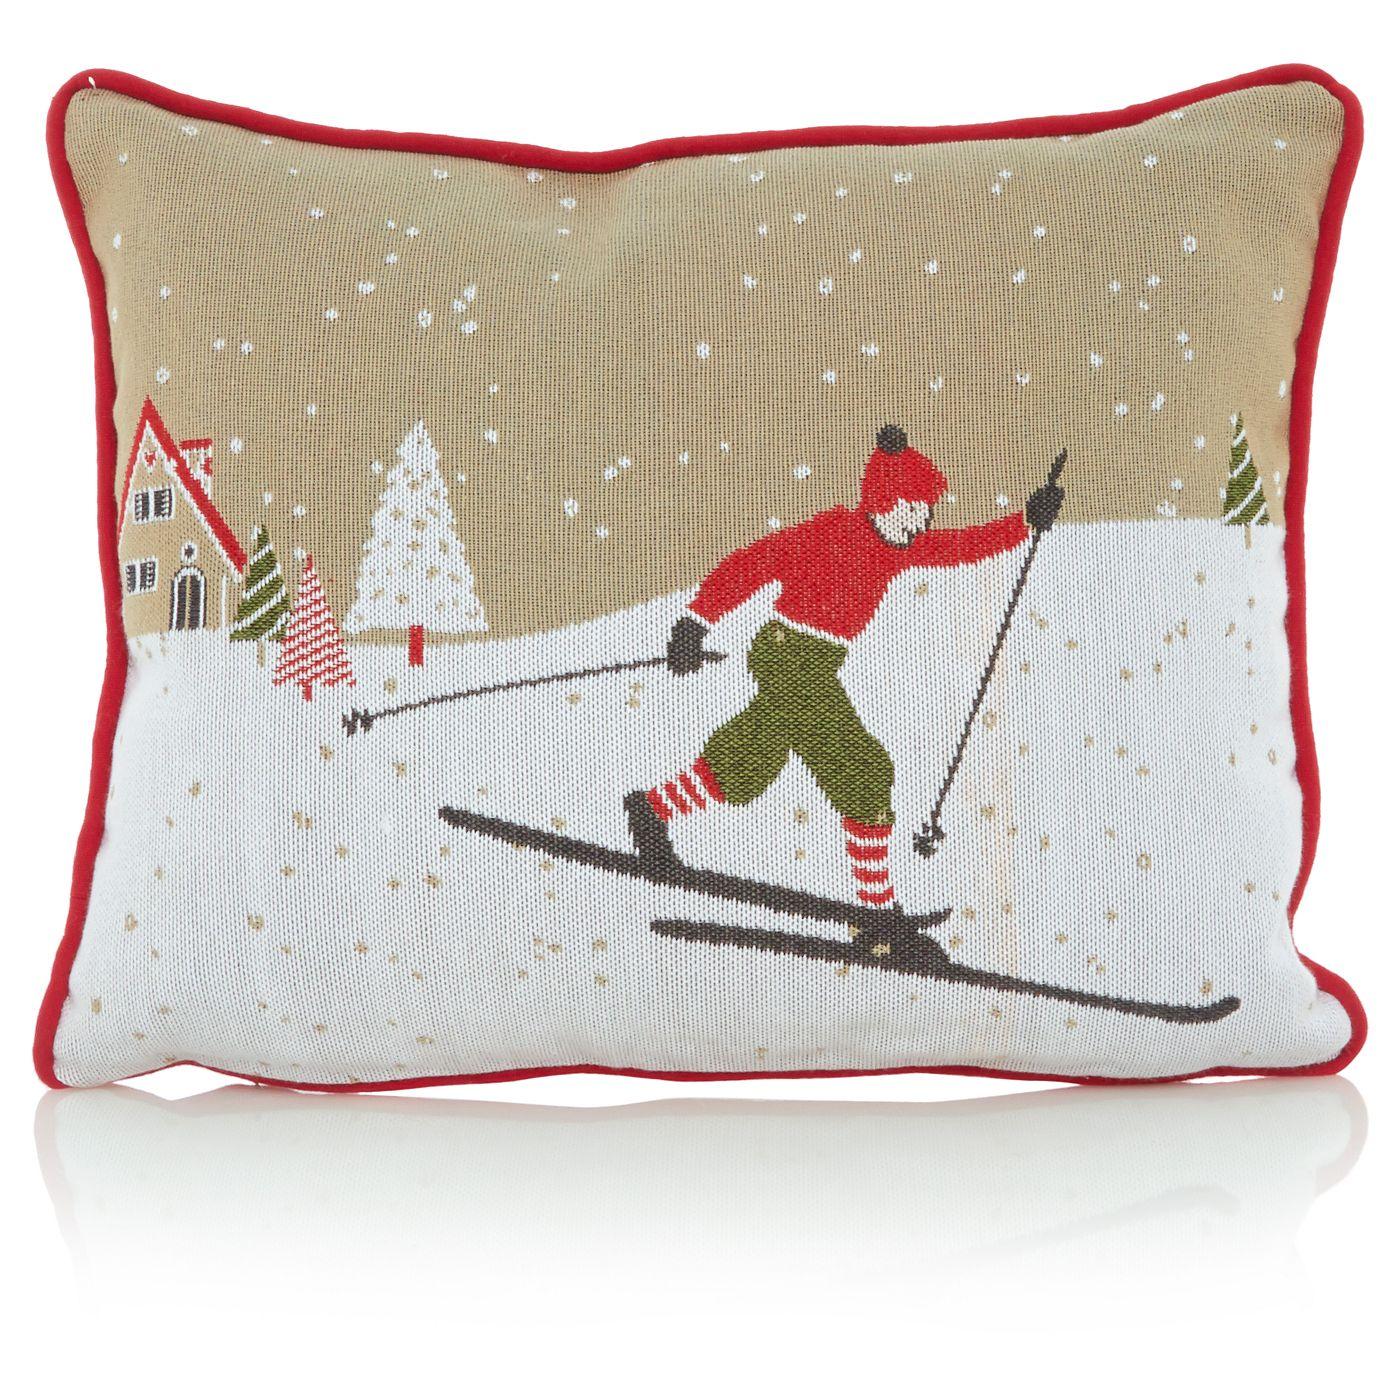 Asda Online Christmas Decorations: George Home Ski Scene Cushion